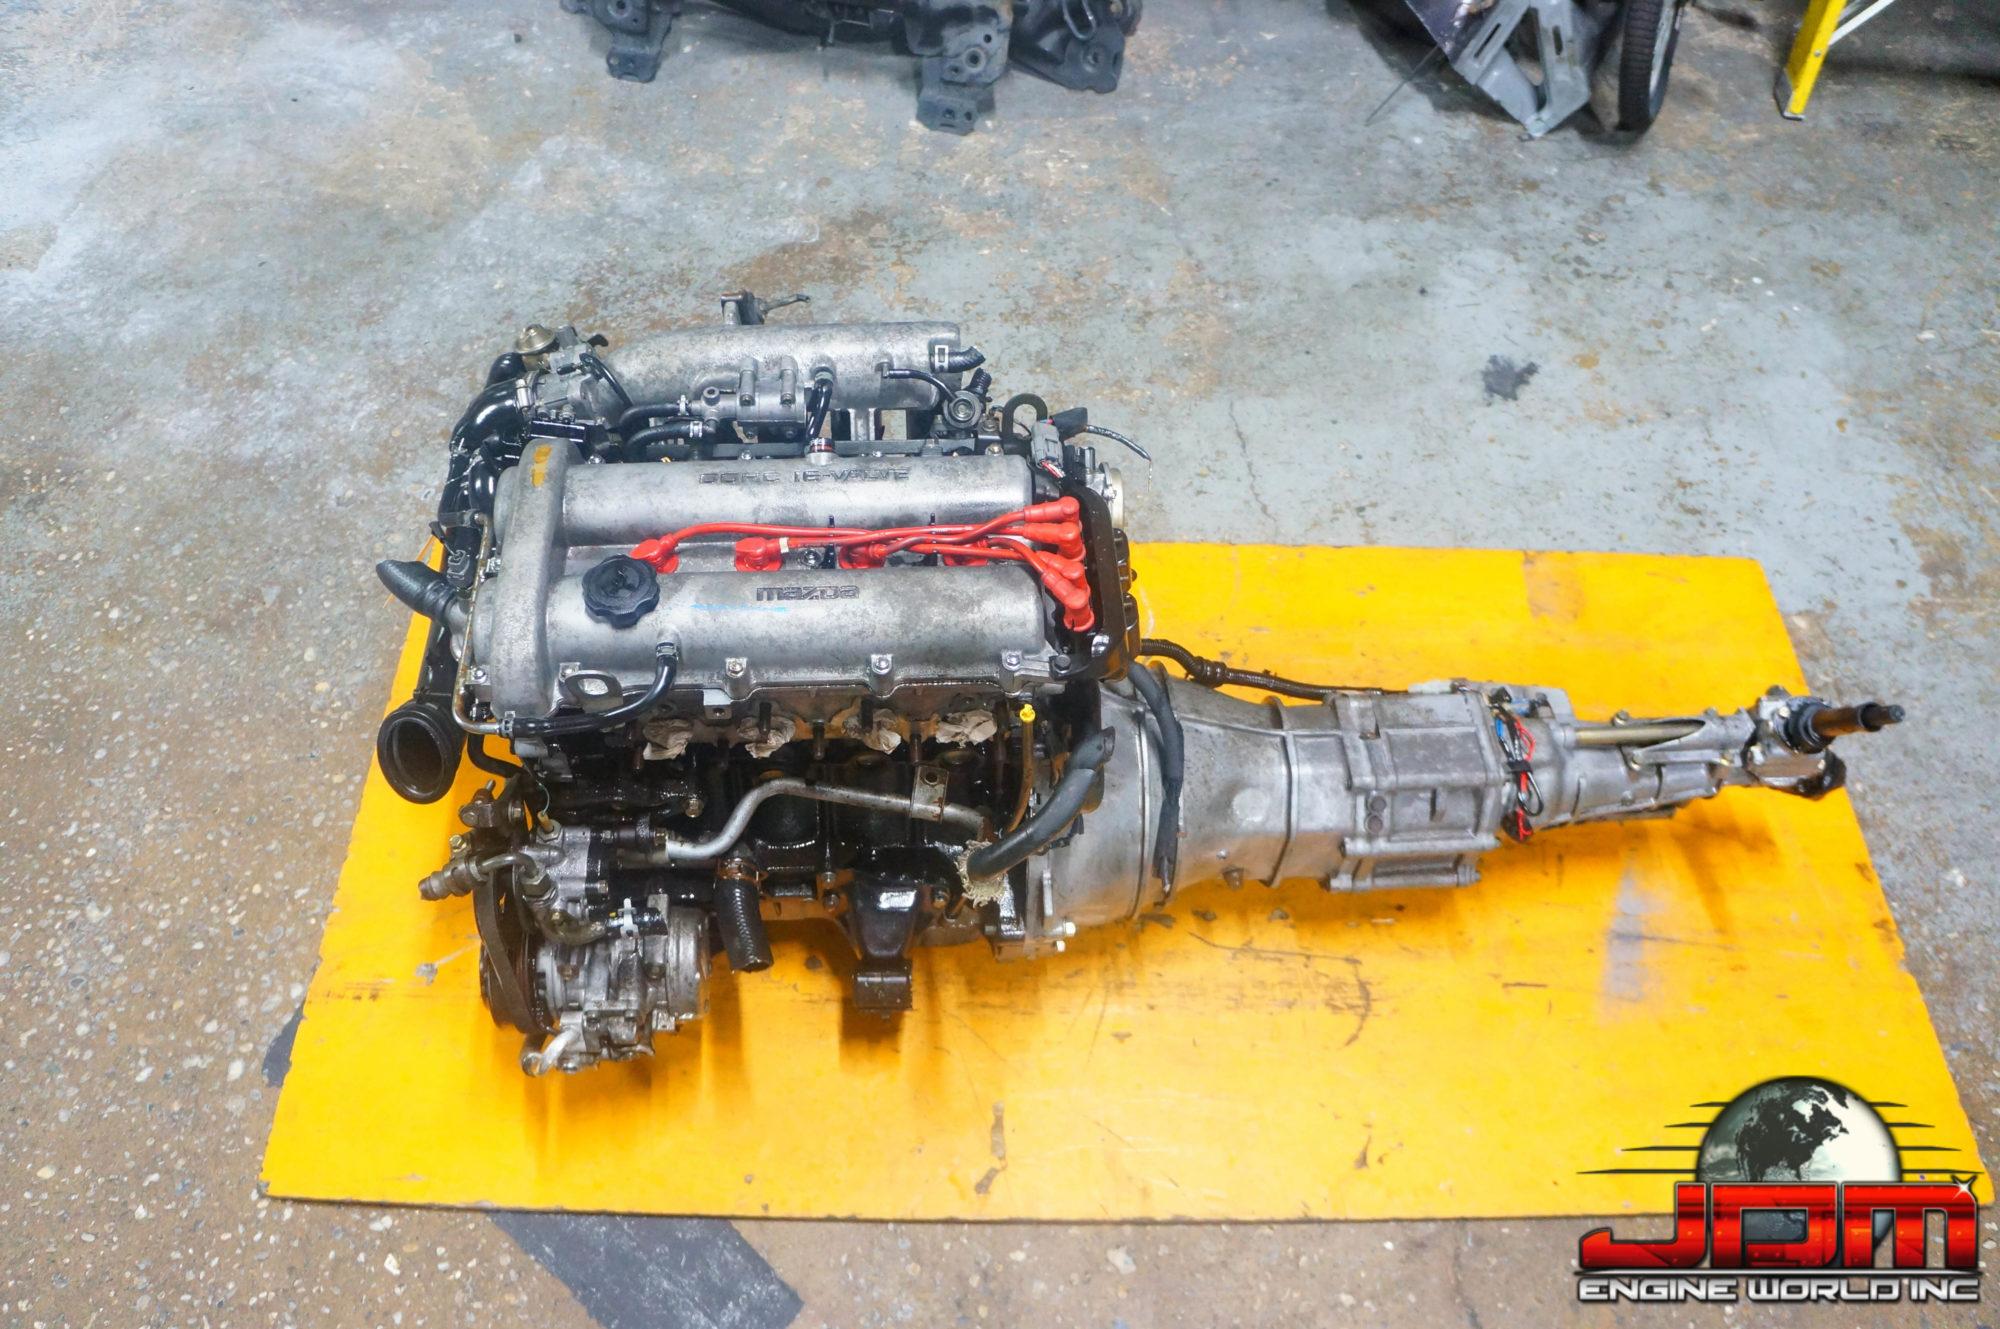 JDM B6 99-00 ENGINE WITH 5 SPEED MANUAL TRANSMISSION